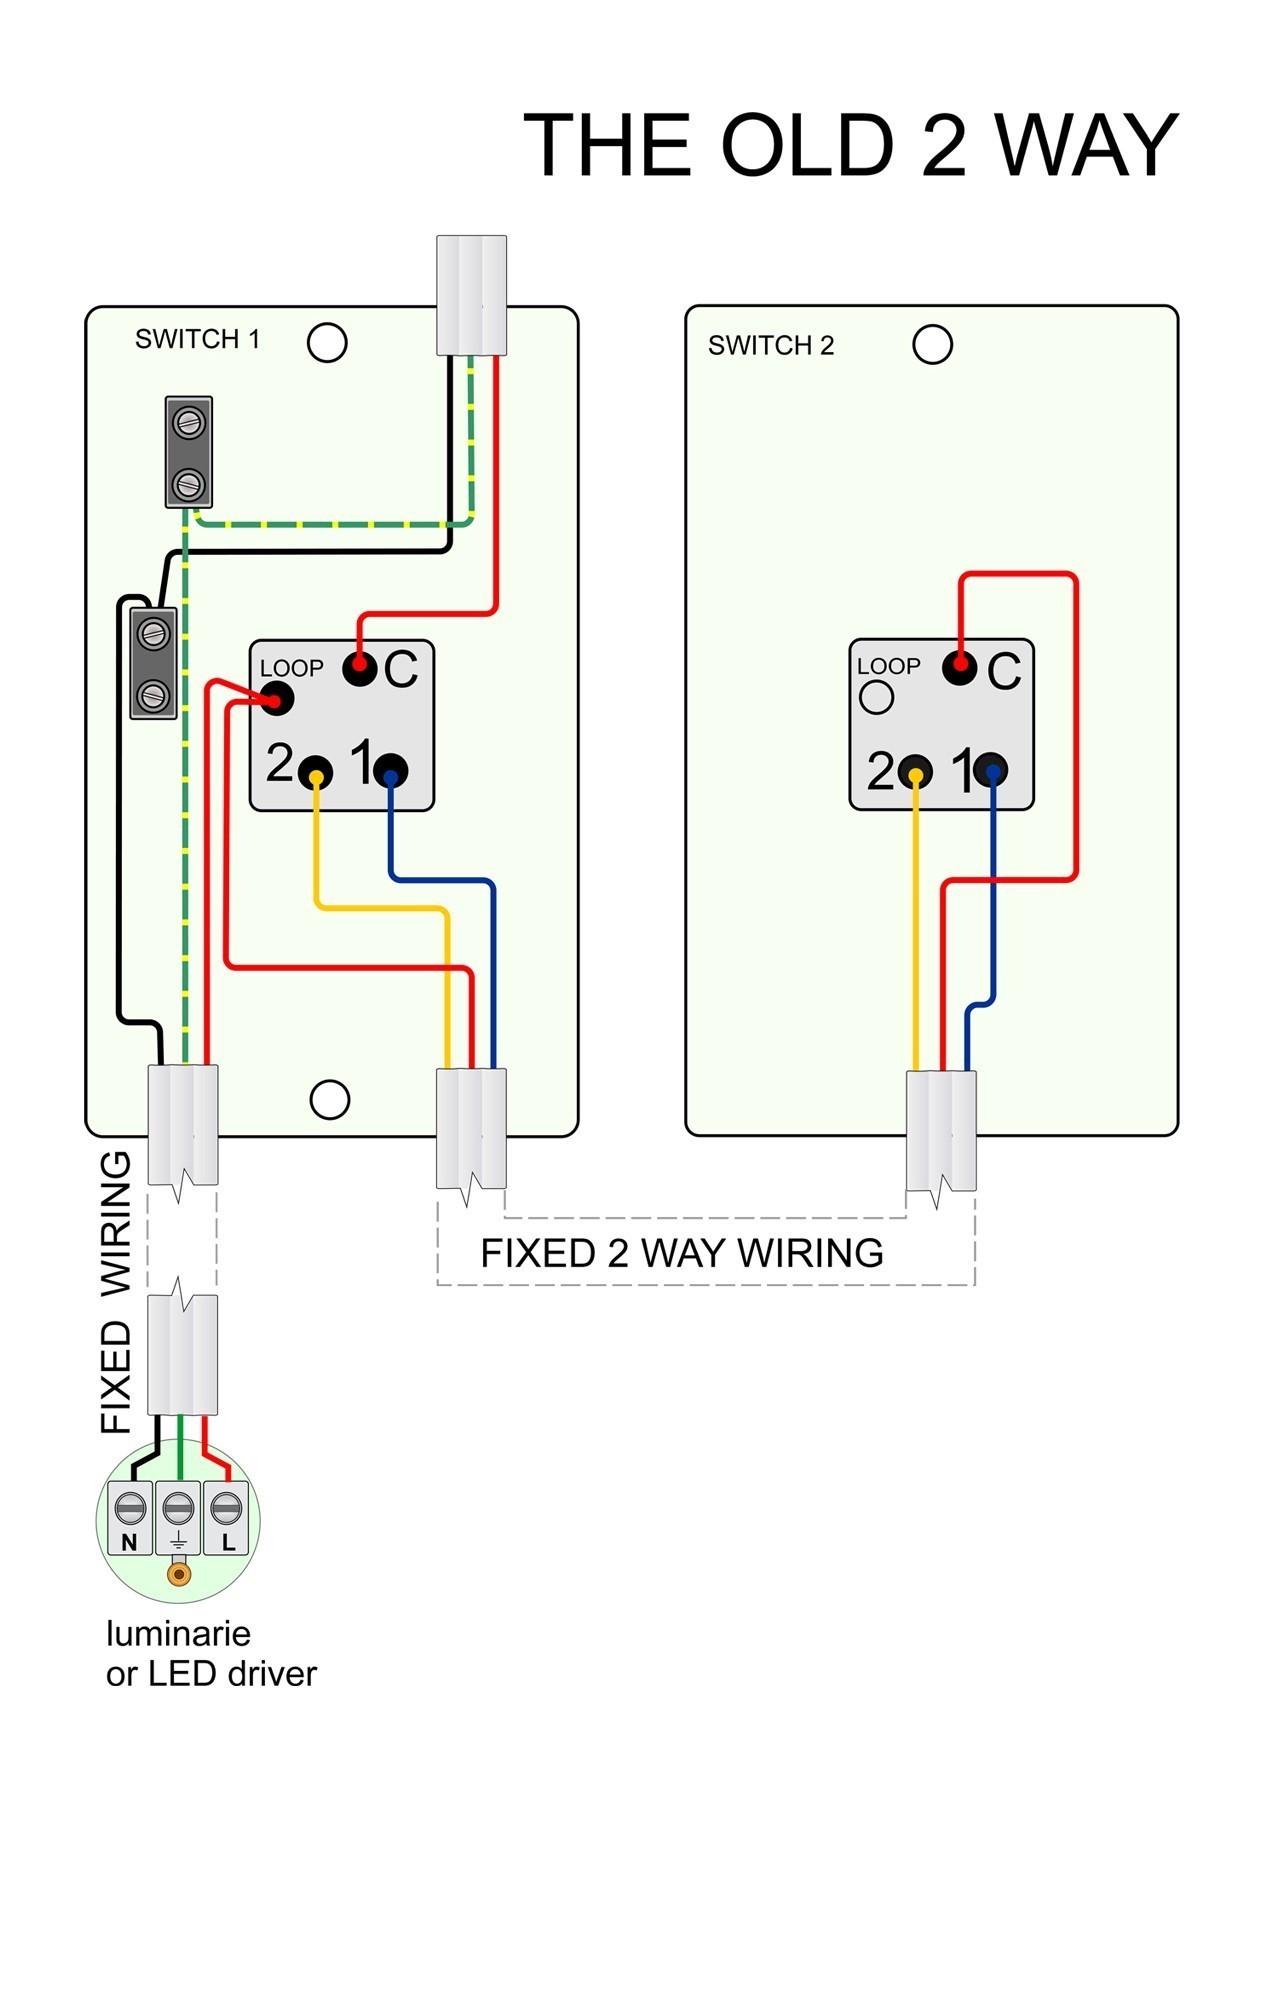 ZC_6220] Switch Wiring Diagram Clipsal Wiring A Two Way Switch Wiring  Diagram Wiring DiagramBedr Apom Lectu Heli Lectu Aeocy Tixat Mohammedshrine Librar Wiring 101